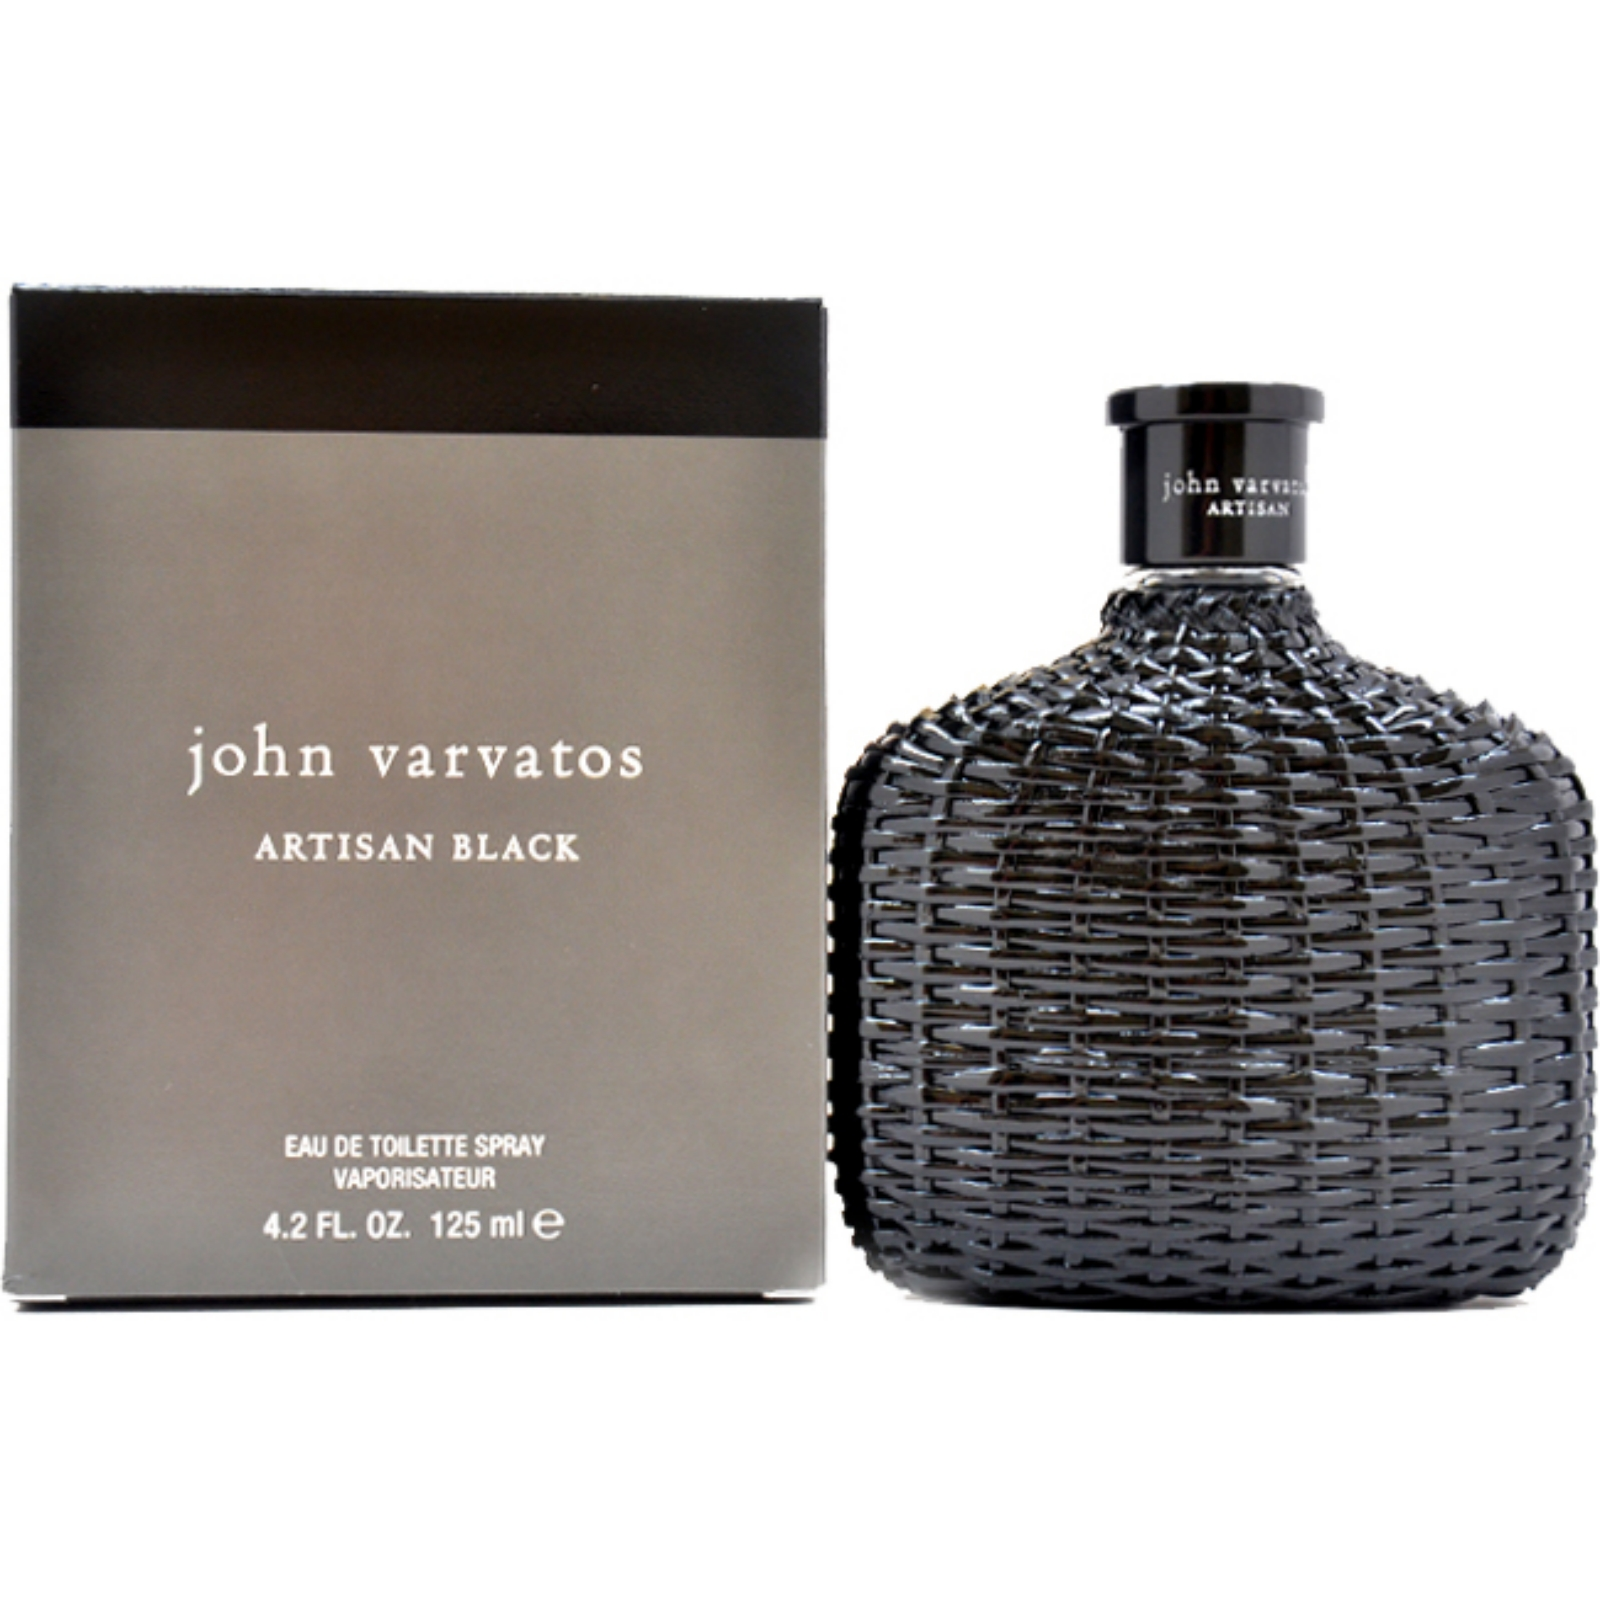 John Varvatos John Varvatos Artisan Black by John Varvatos for Men - 4.2 oz EDT Spray PartNumber: 003V003268352000P KsnValue: 3268352 MfgPartNumber: M-3646